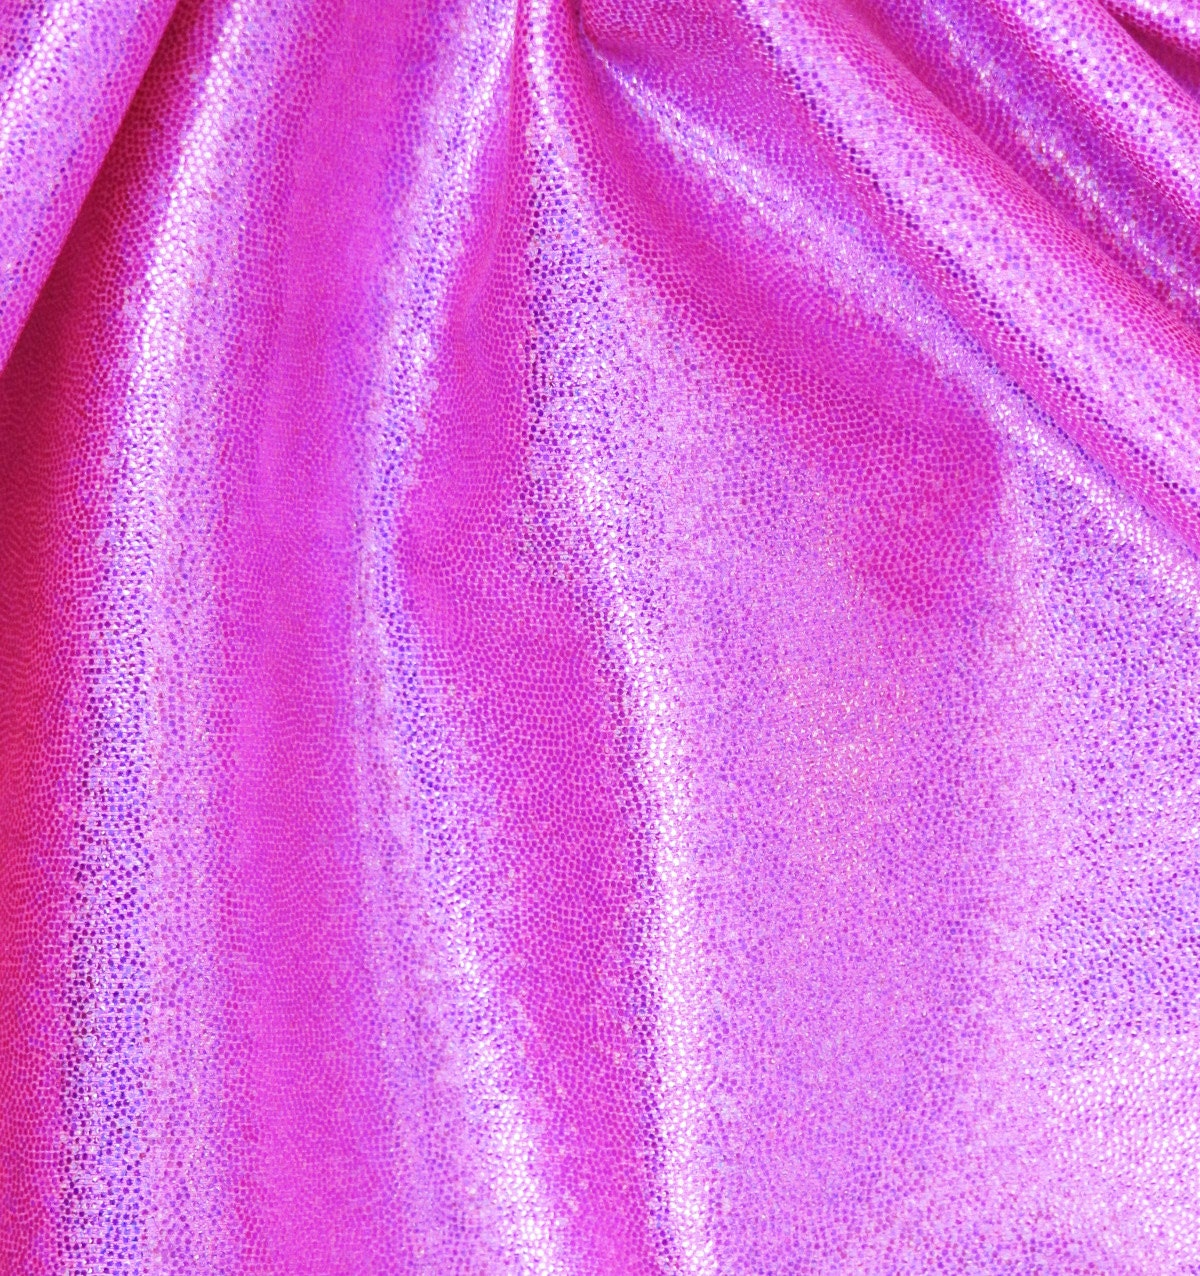 Holographic mystique spandex fabric nylon lycra stretch for Nylon fabric